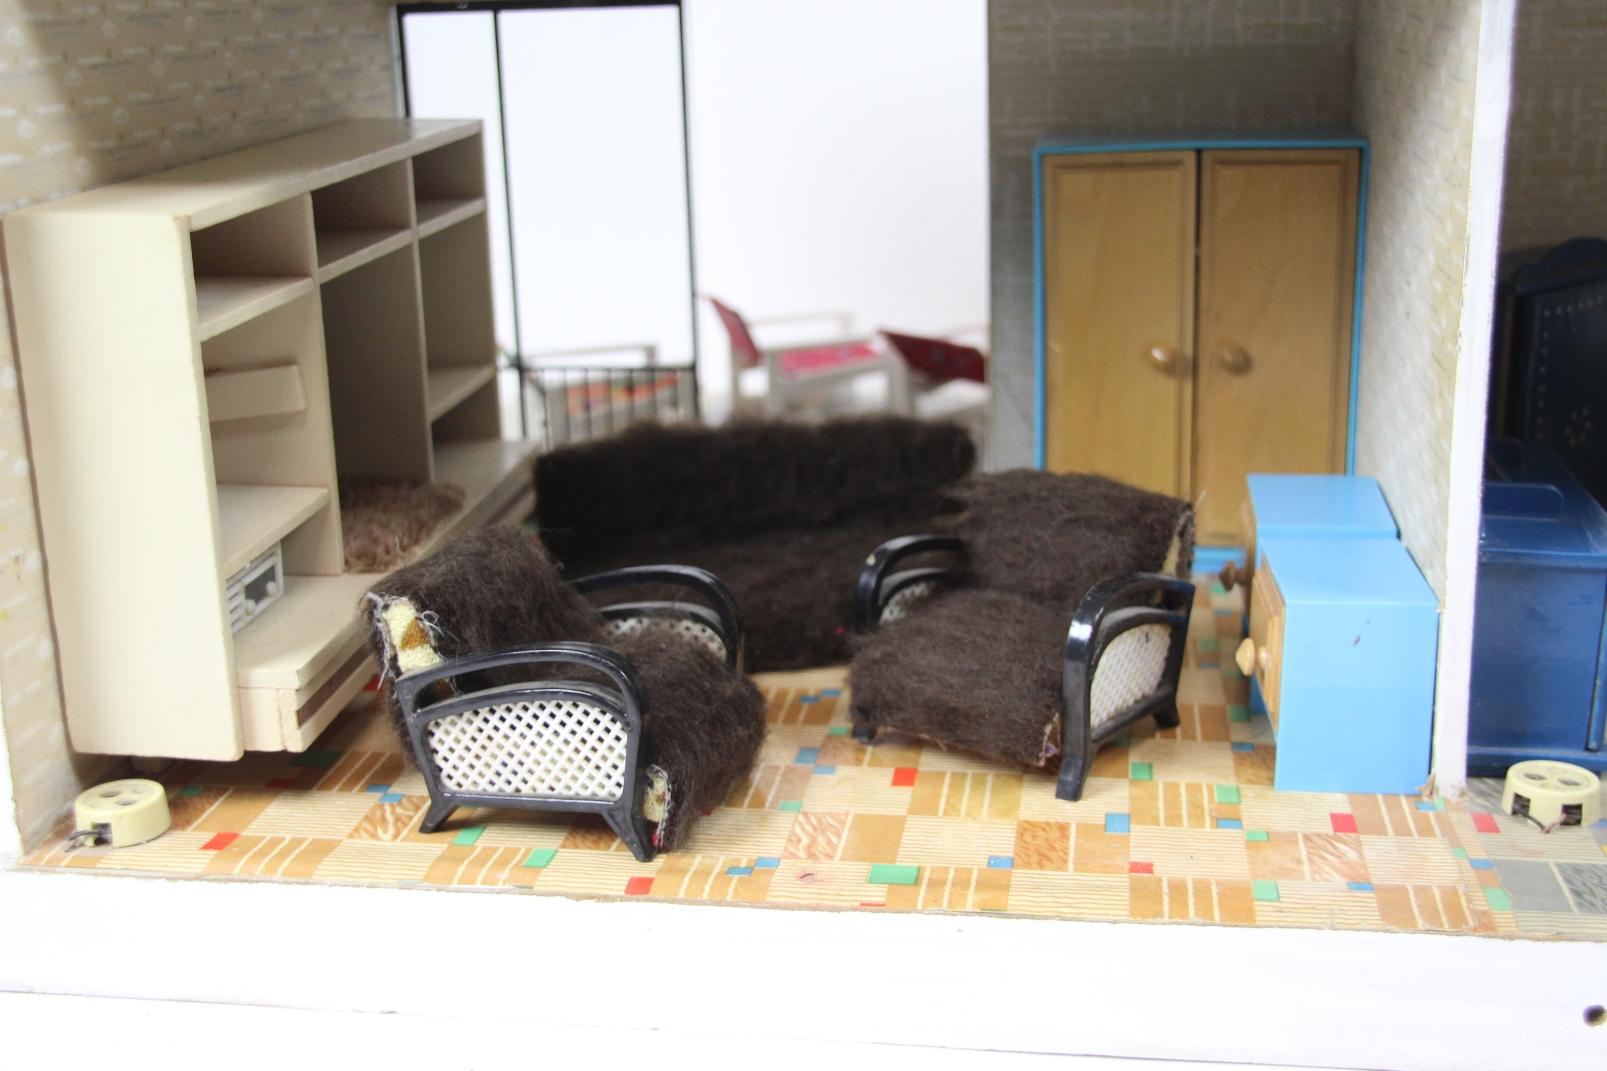 altes ddr puppenhaus bauhaus stil mit m bel zubeh r. Black Bedroom Furniture Sets. Home Design Ideas